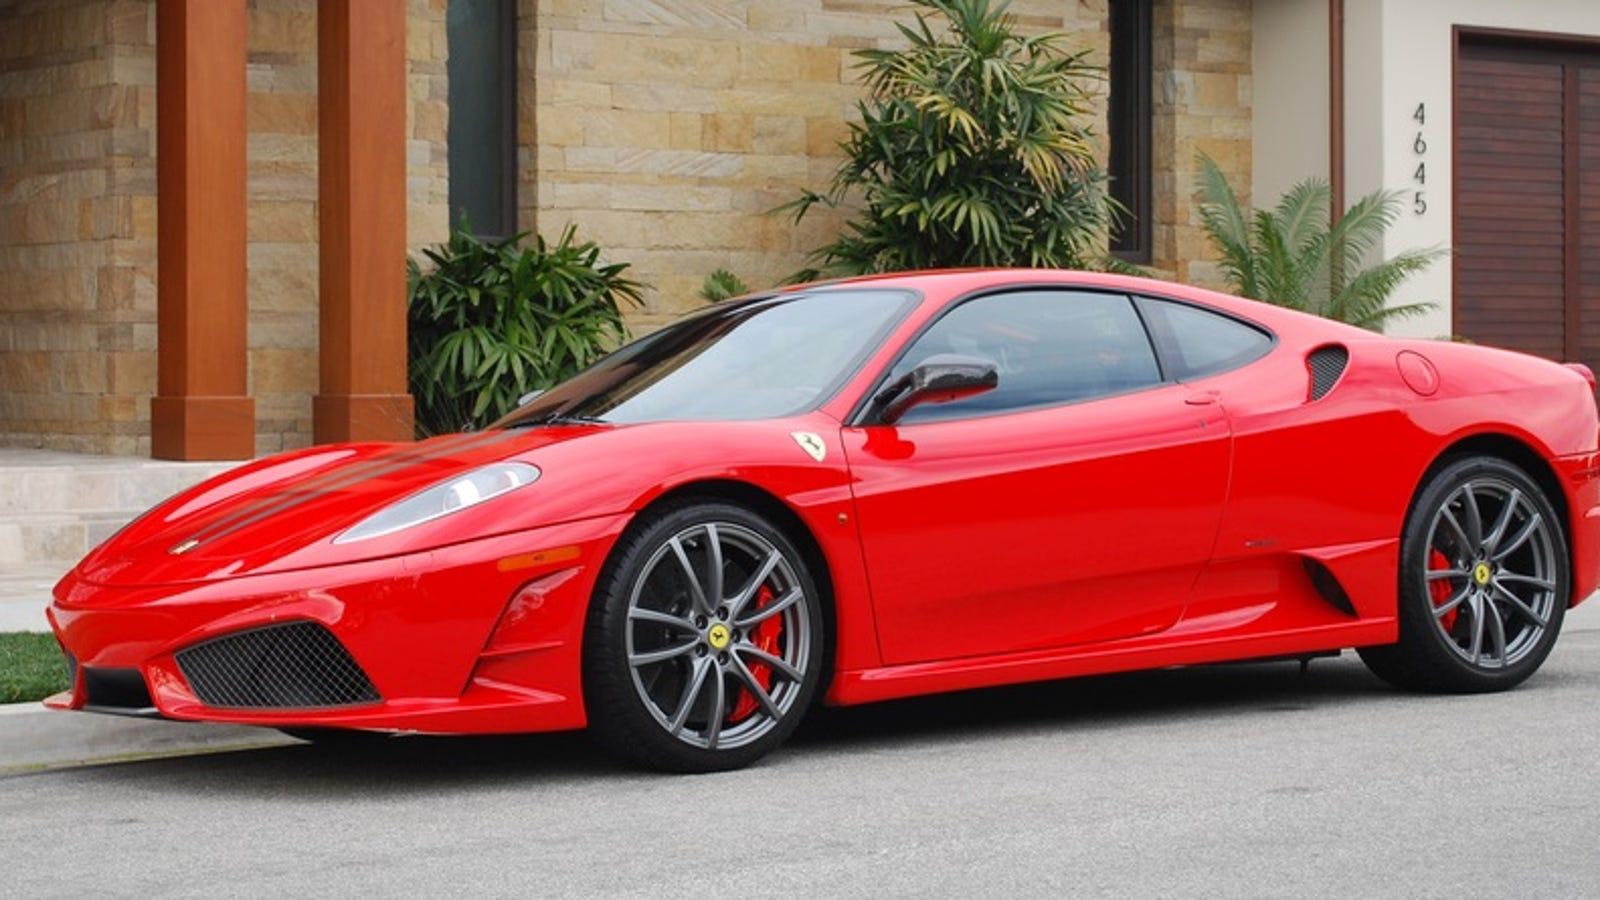 Ferrari 458 maintenance costs